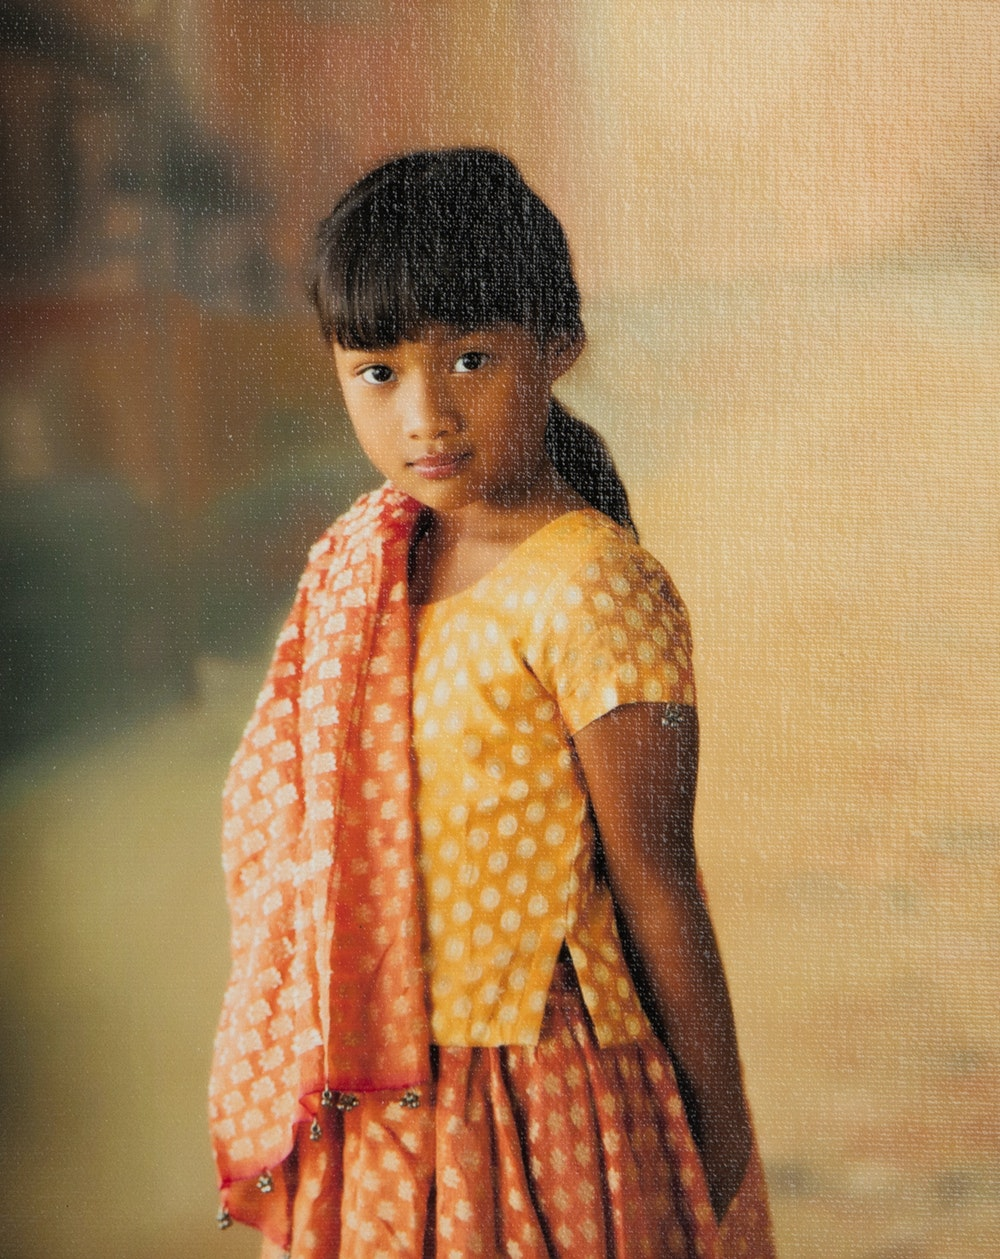 Giclée Portrait Canvas with Semi-Gloss Varnish Surface